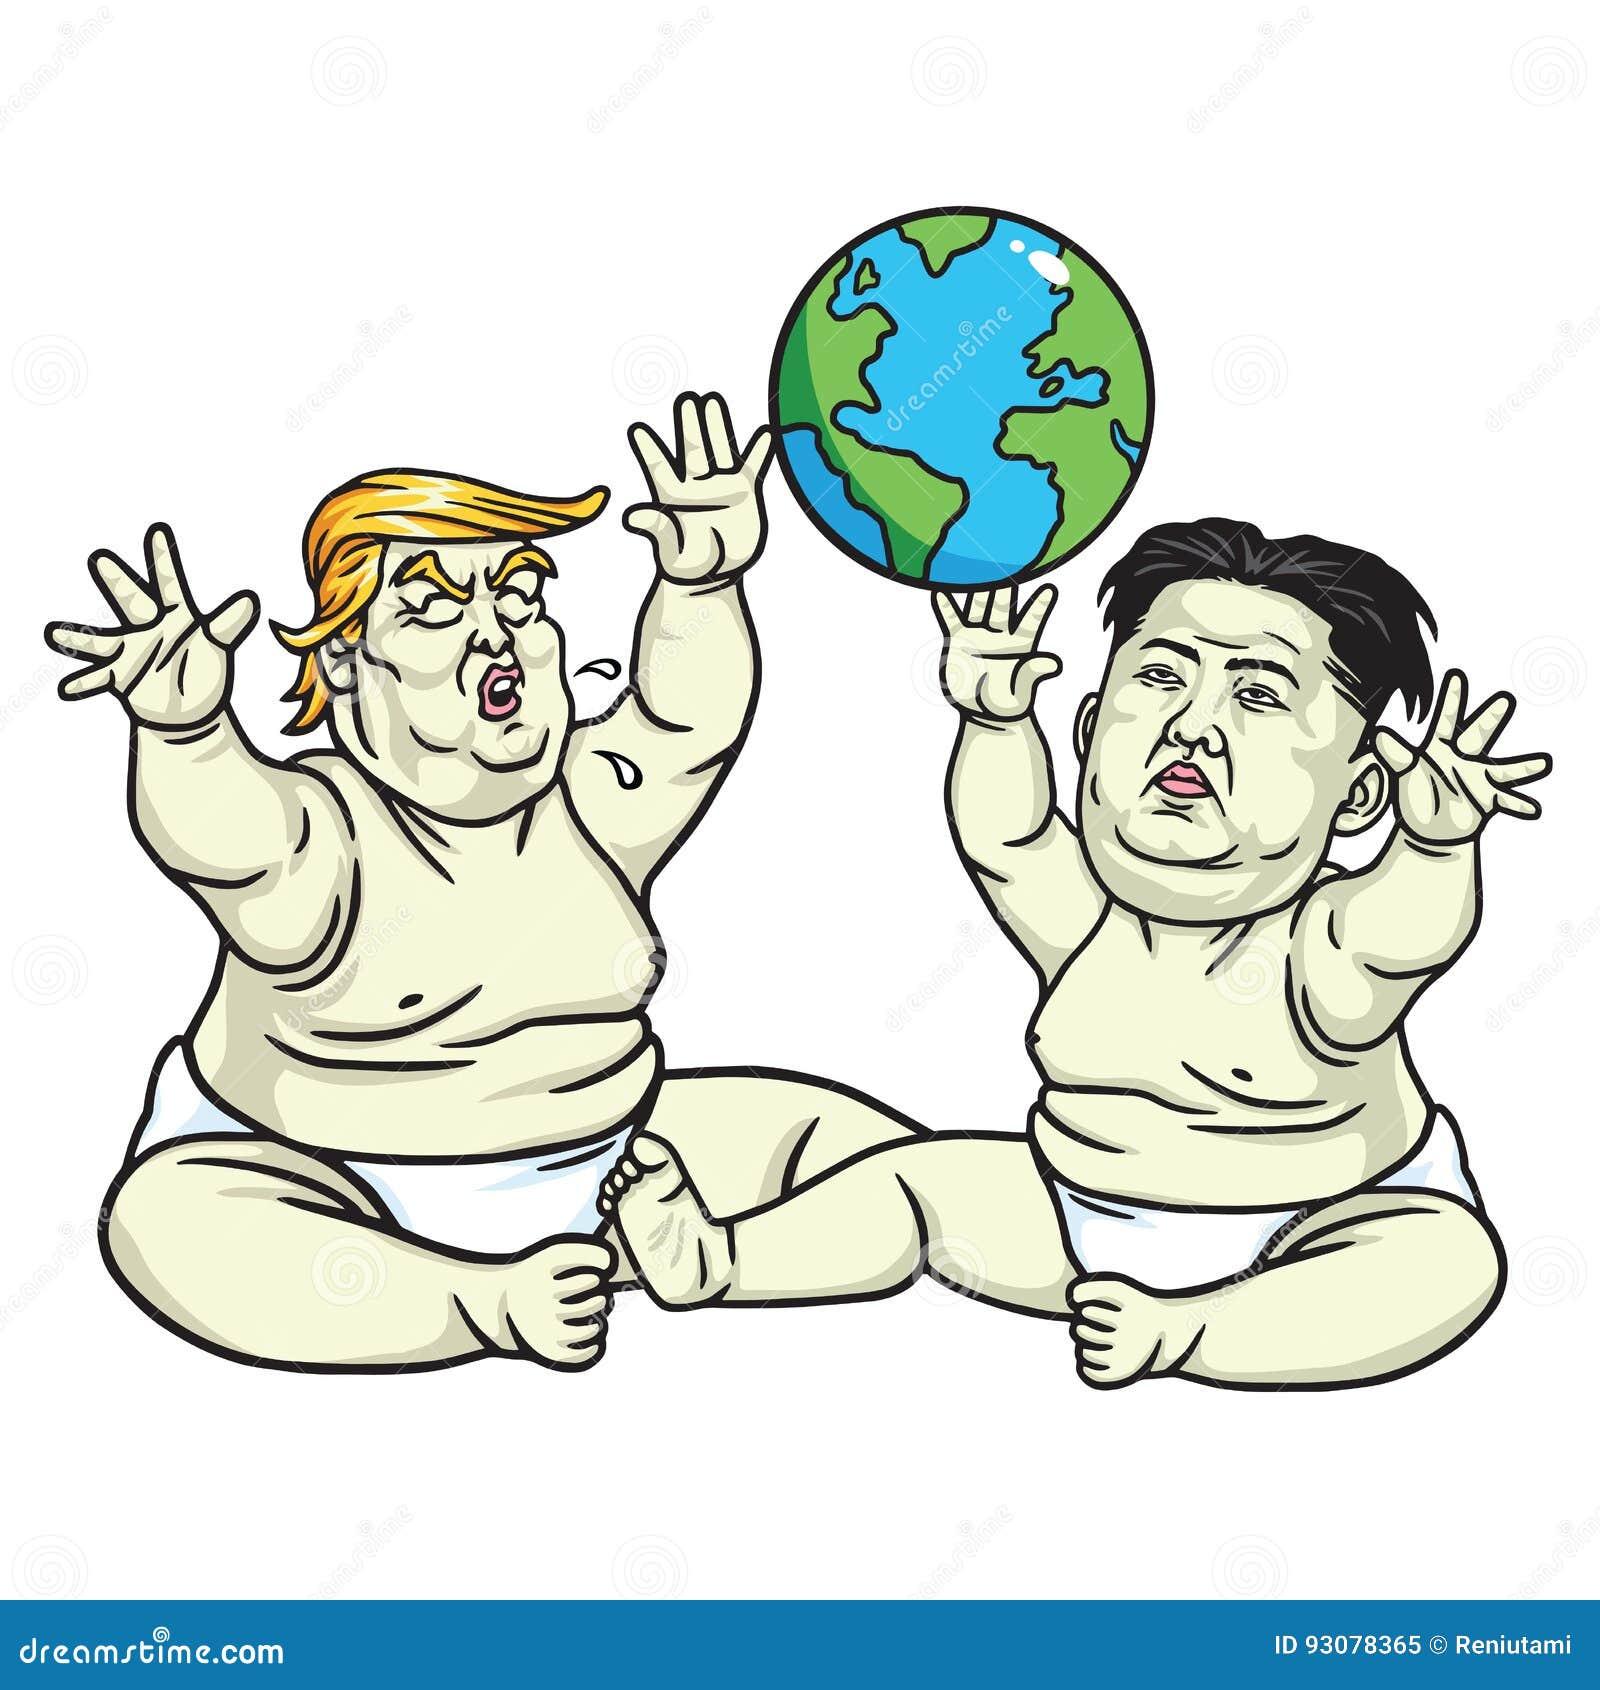 Baby Trump and Kim Jong-un Playing the Globe. Cartoon Illustration. May 25, 2017